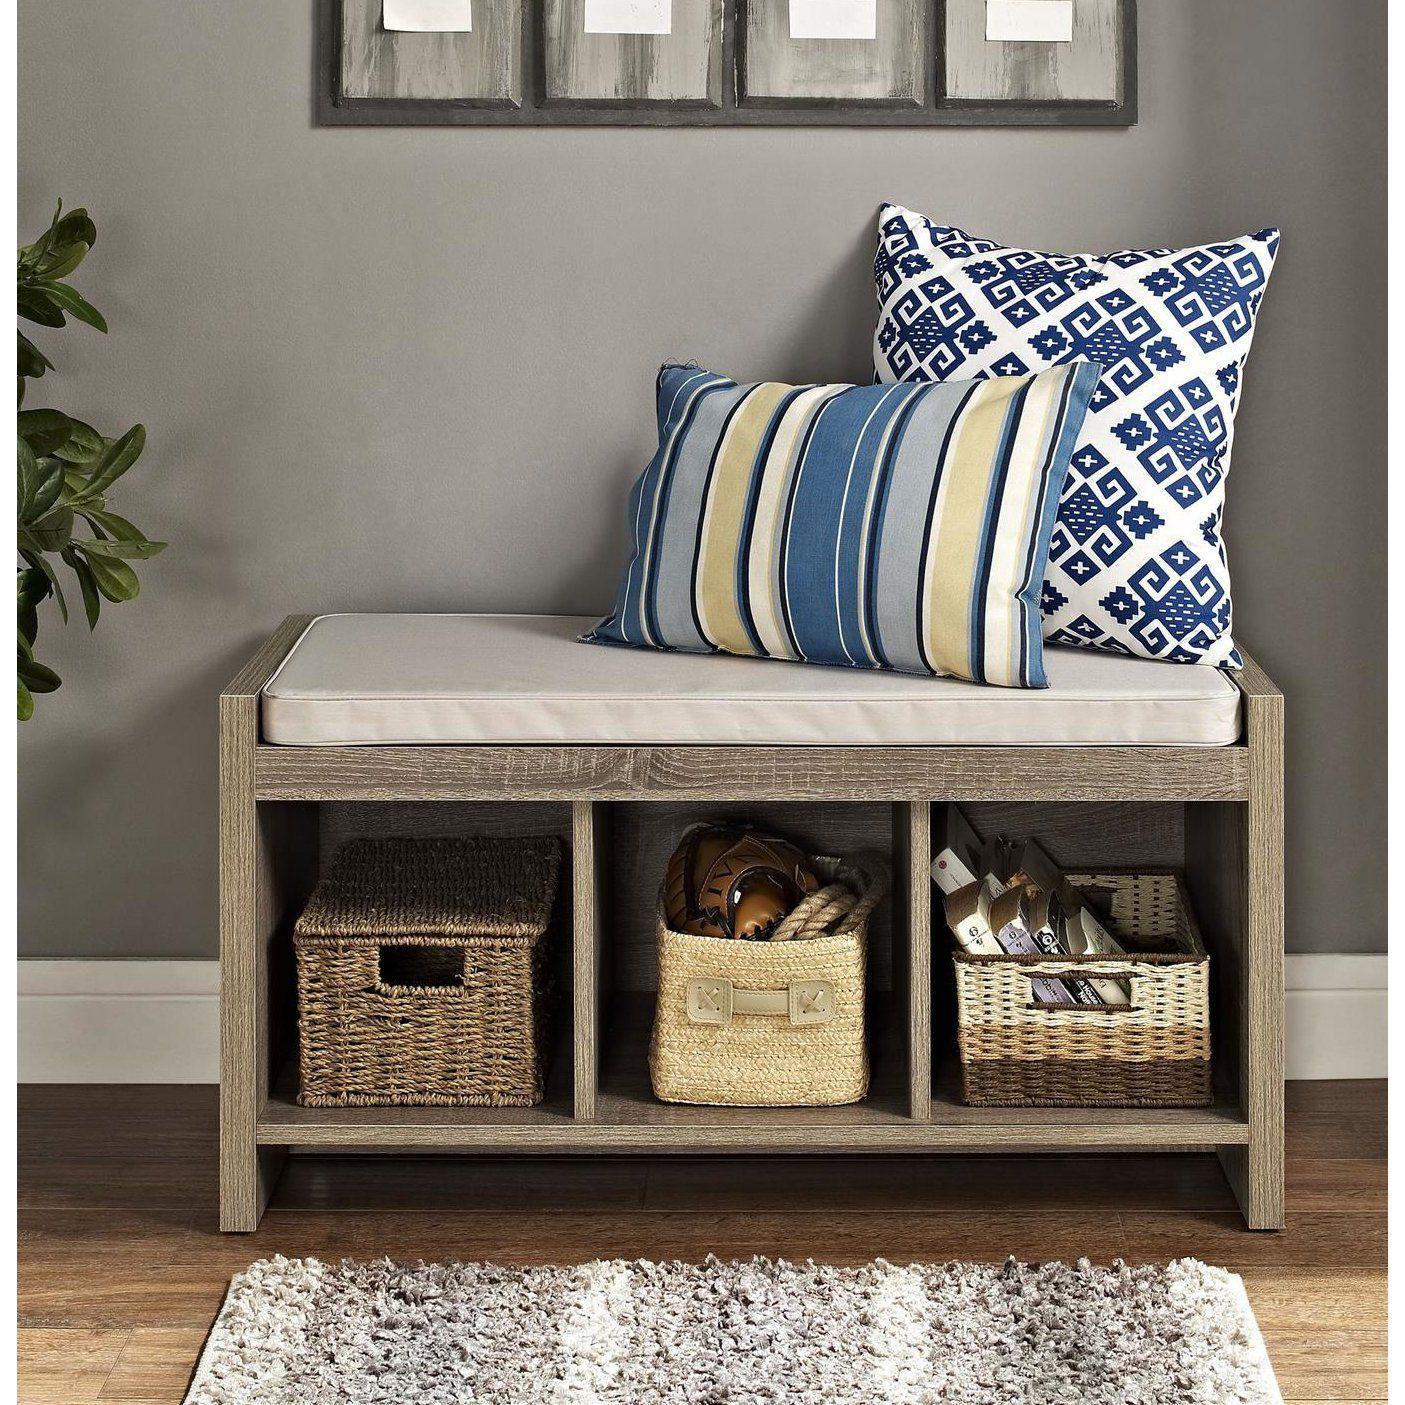 Customer image zoomed minimalista storage bench with